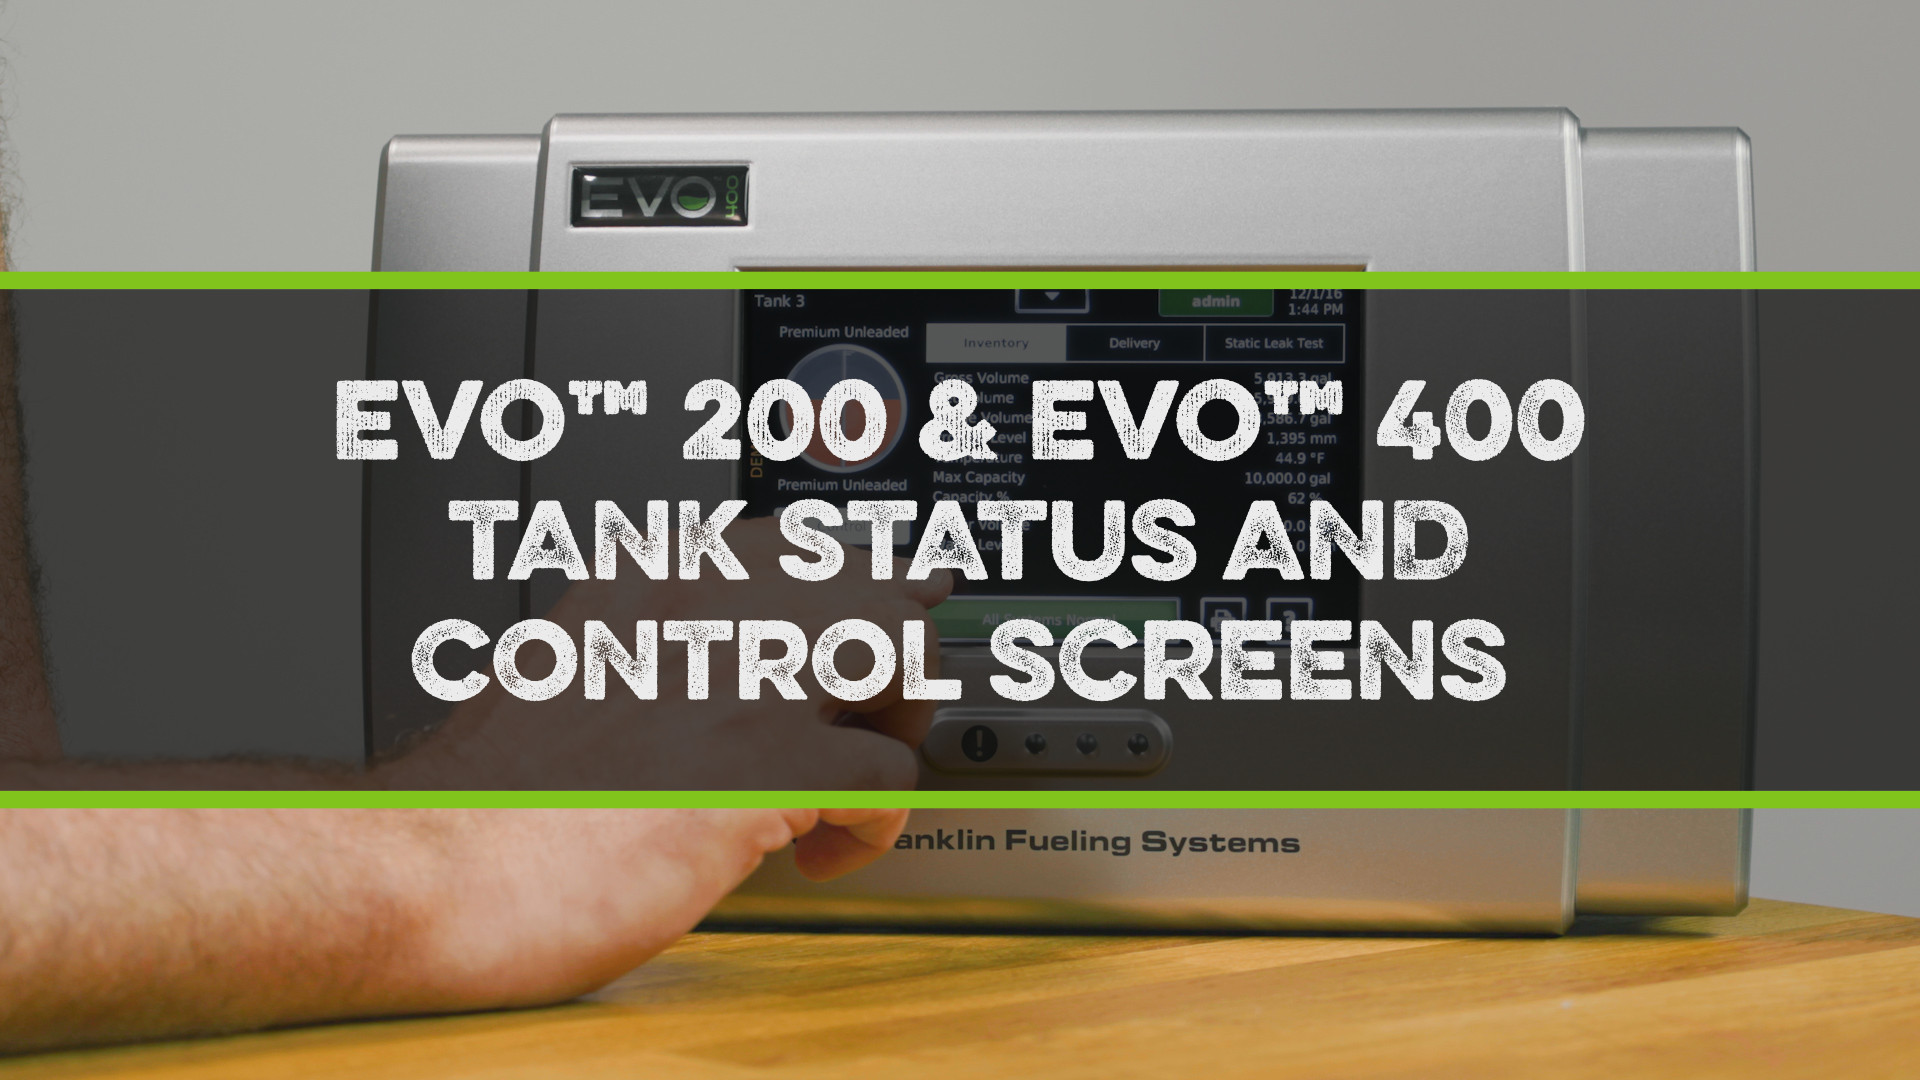 FFS Pro Evo 200-400 Tank Status and Control Screens Video